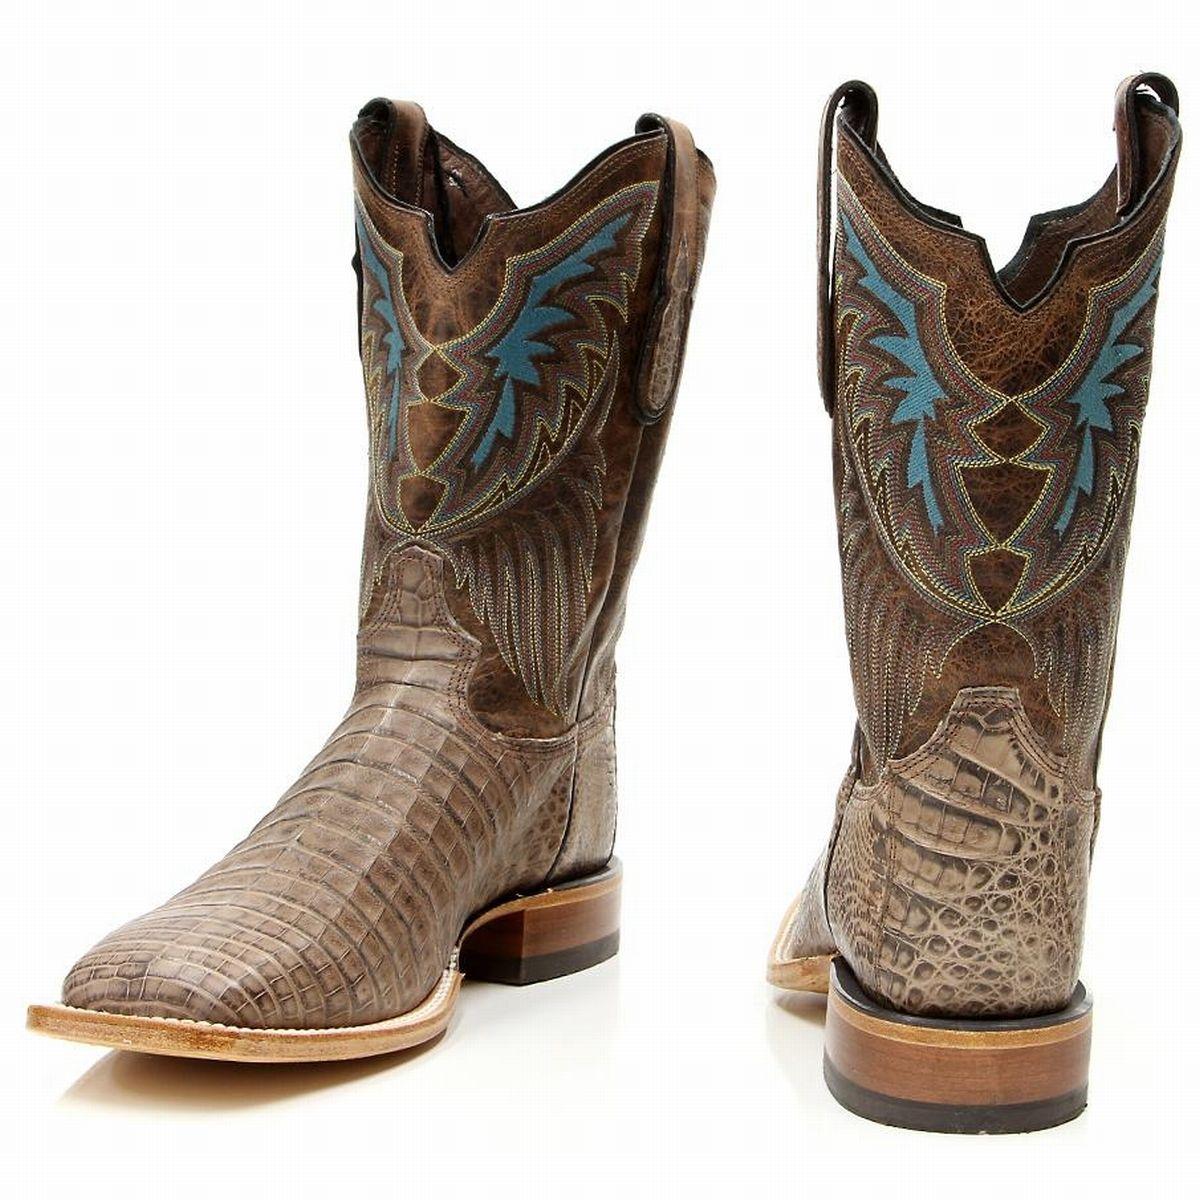 7e58f520398 Tony Lama Men's Kango Lux Black Label Ostrich Western Cowboy Boots ...